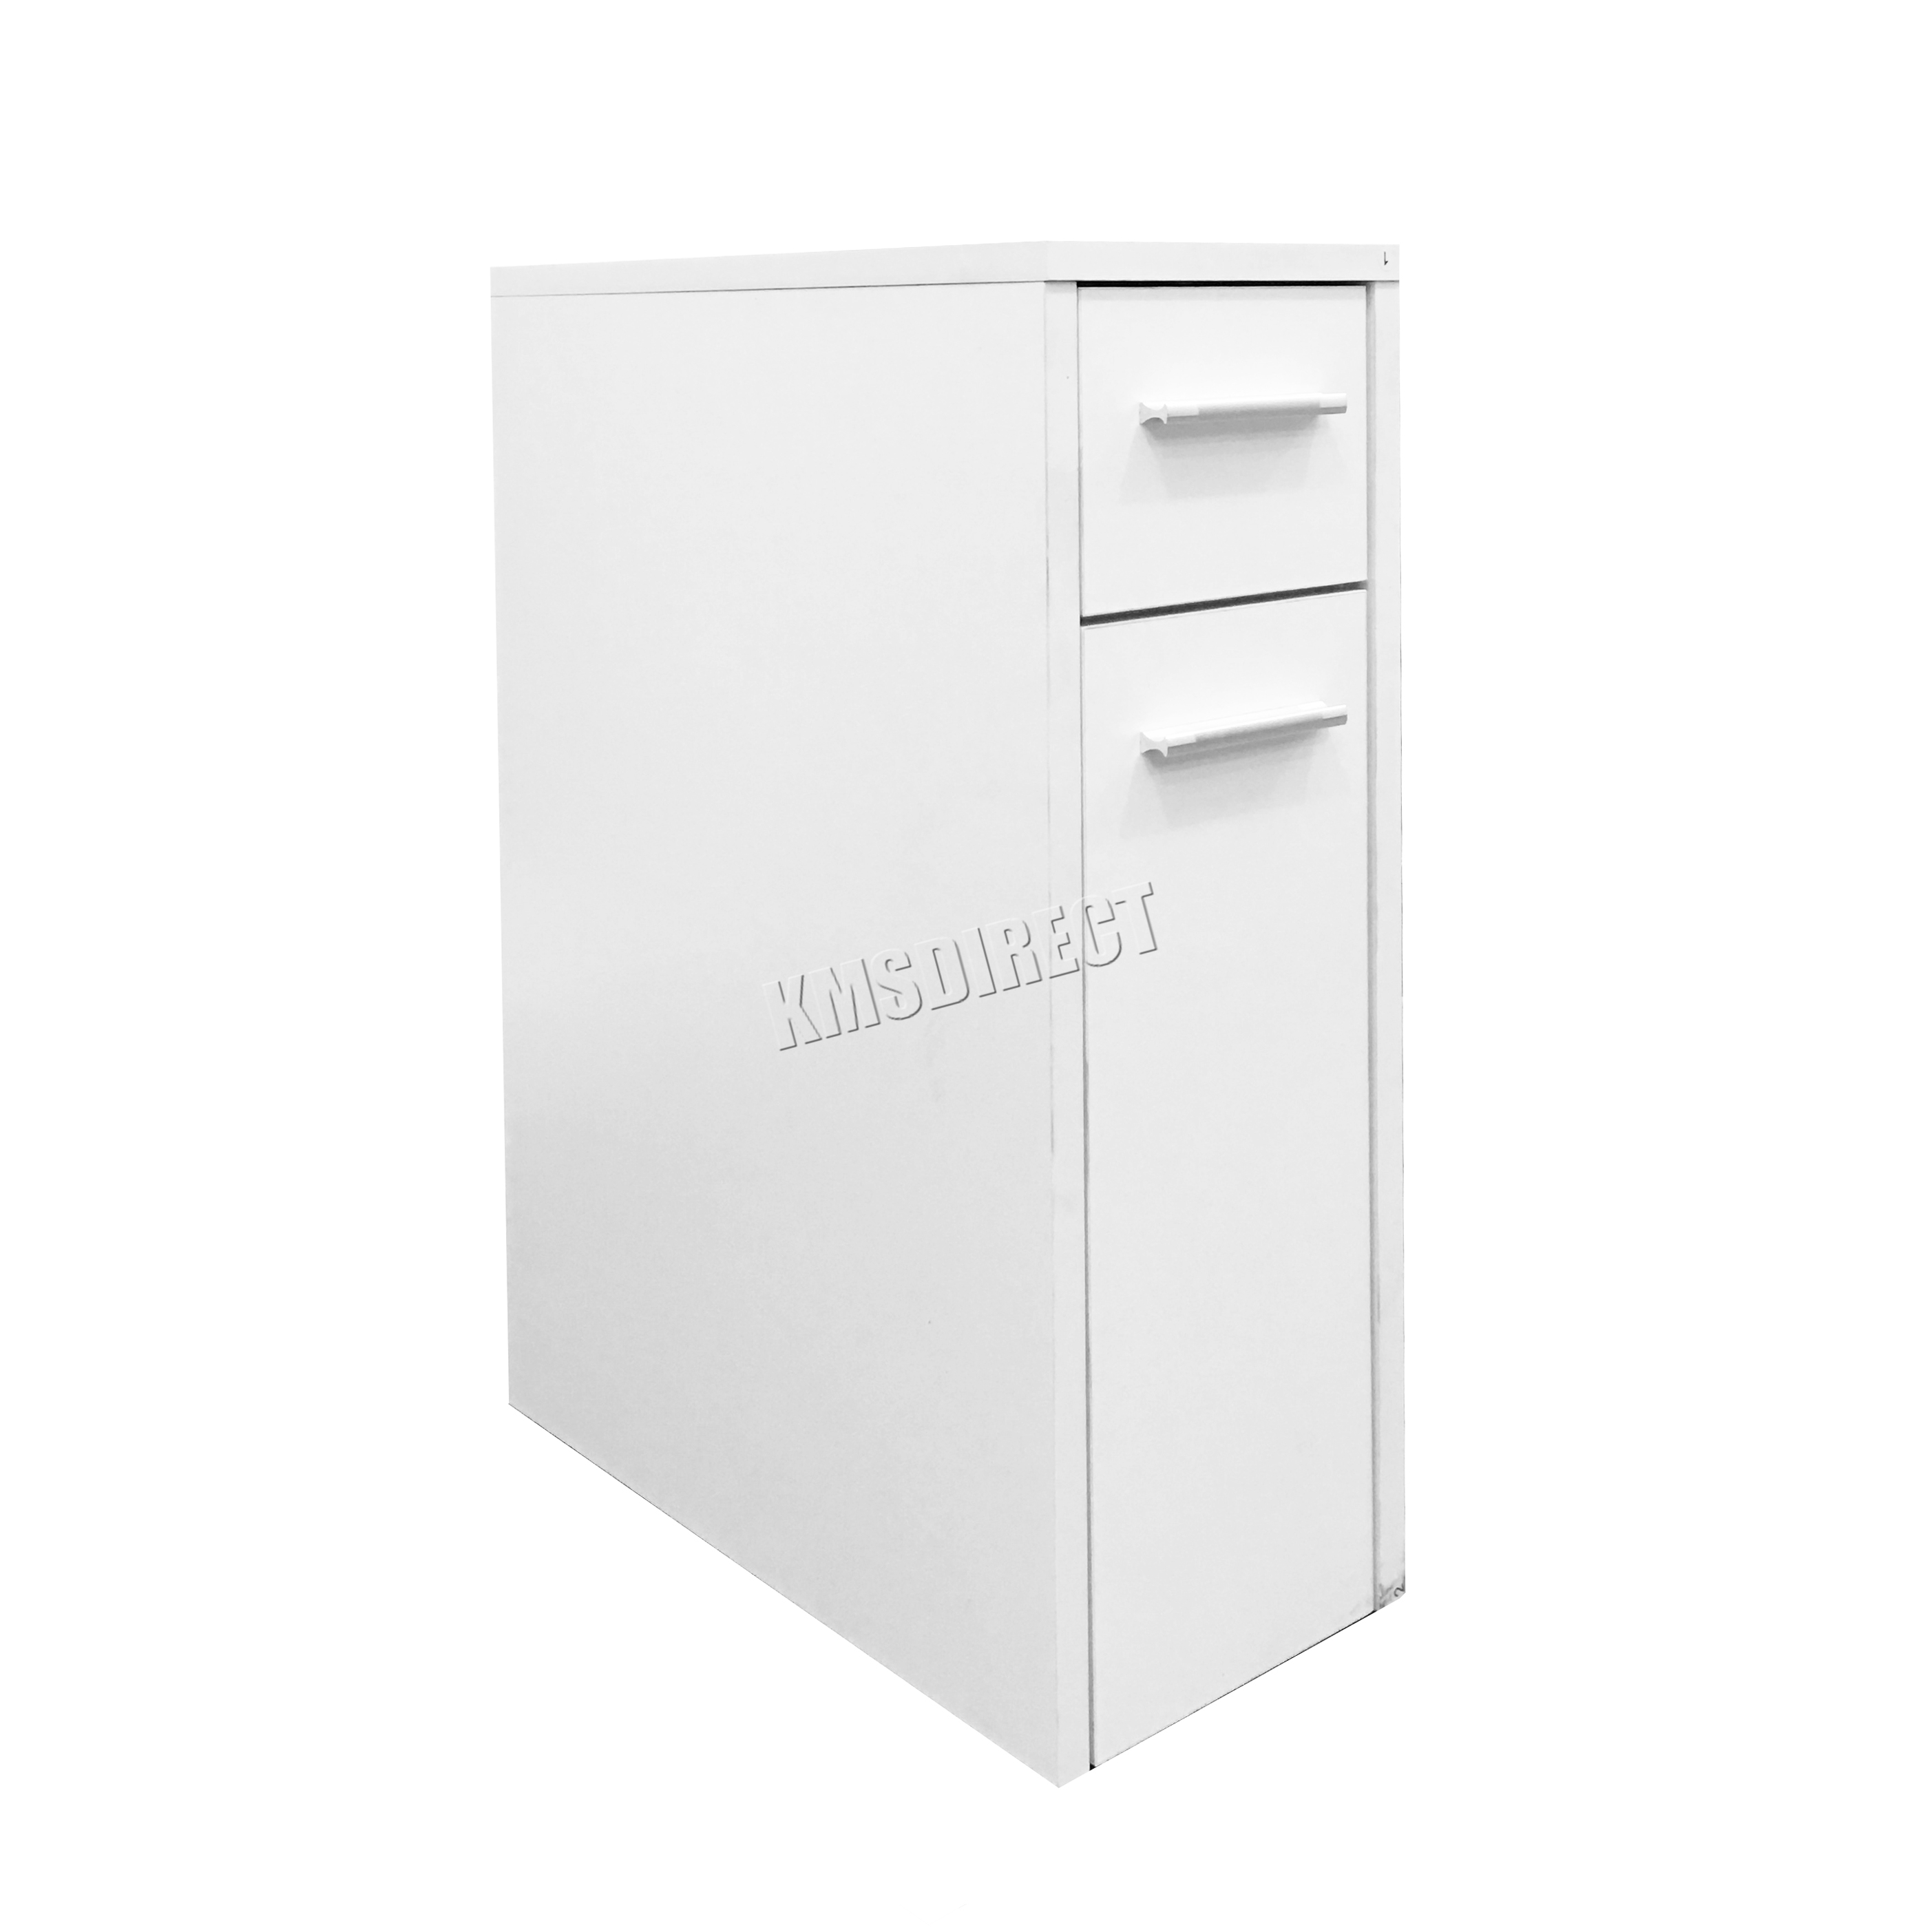 Foxhunter slimline bathroom slide out storage drawer for Slimline bathroom cupboard